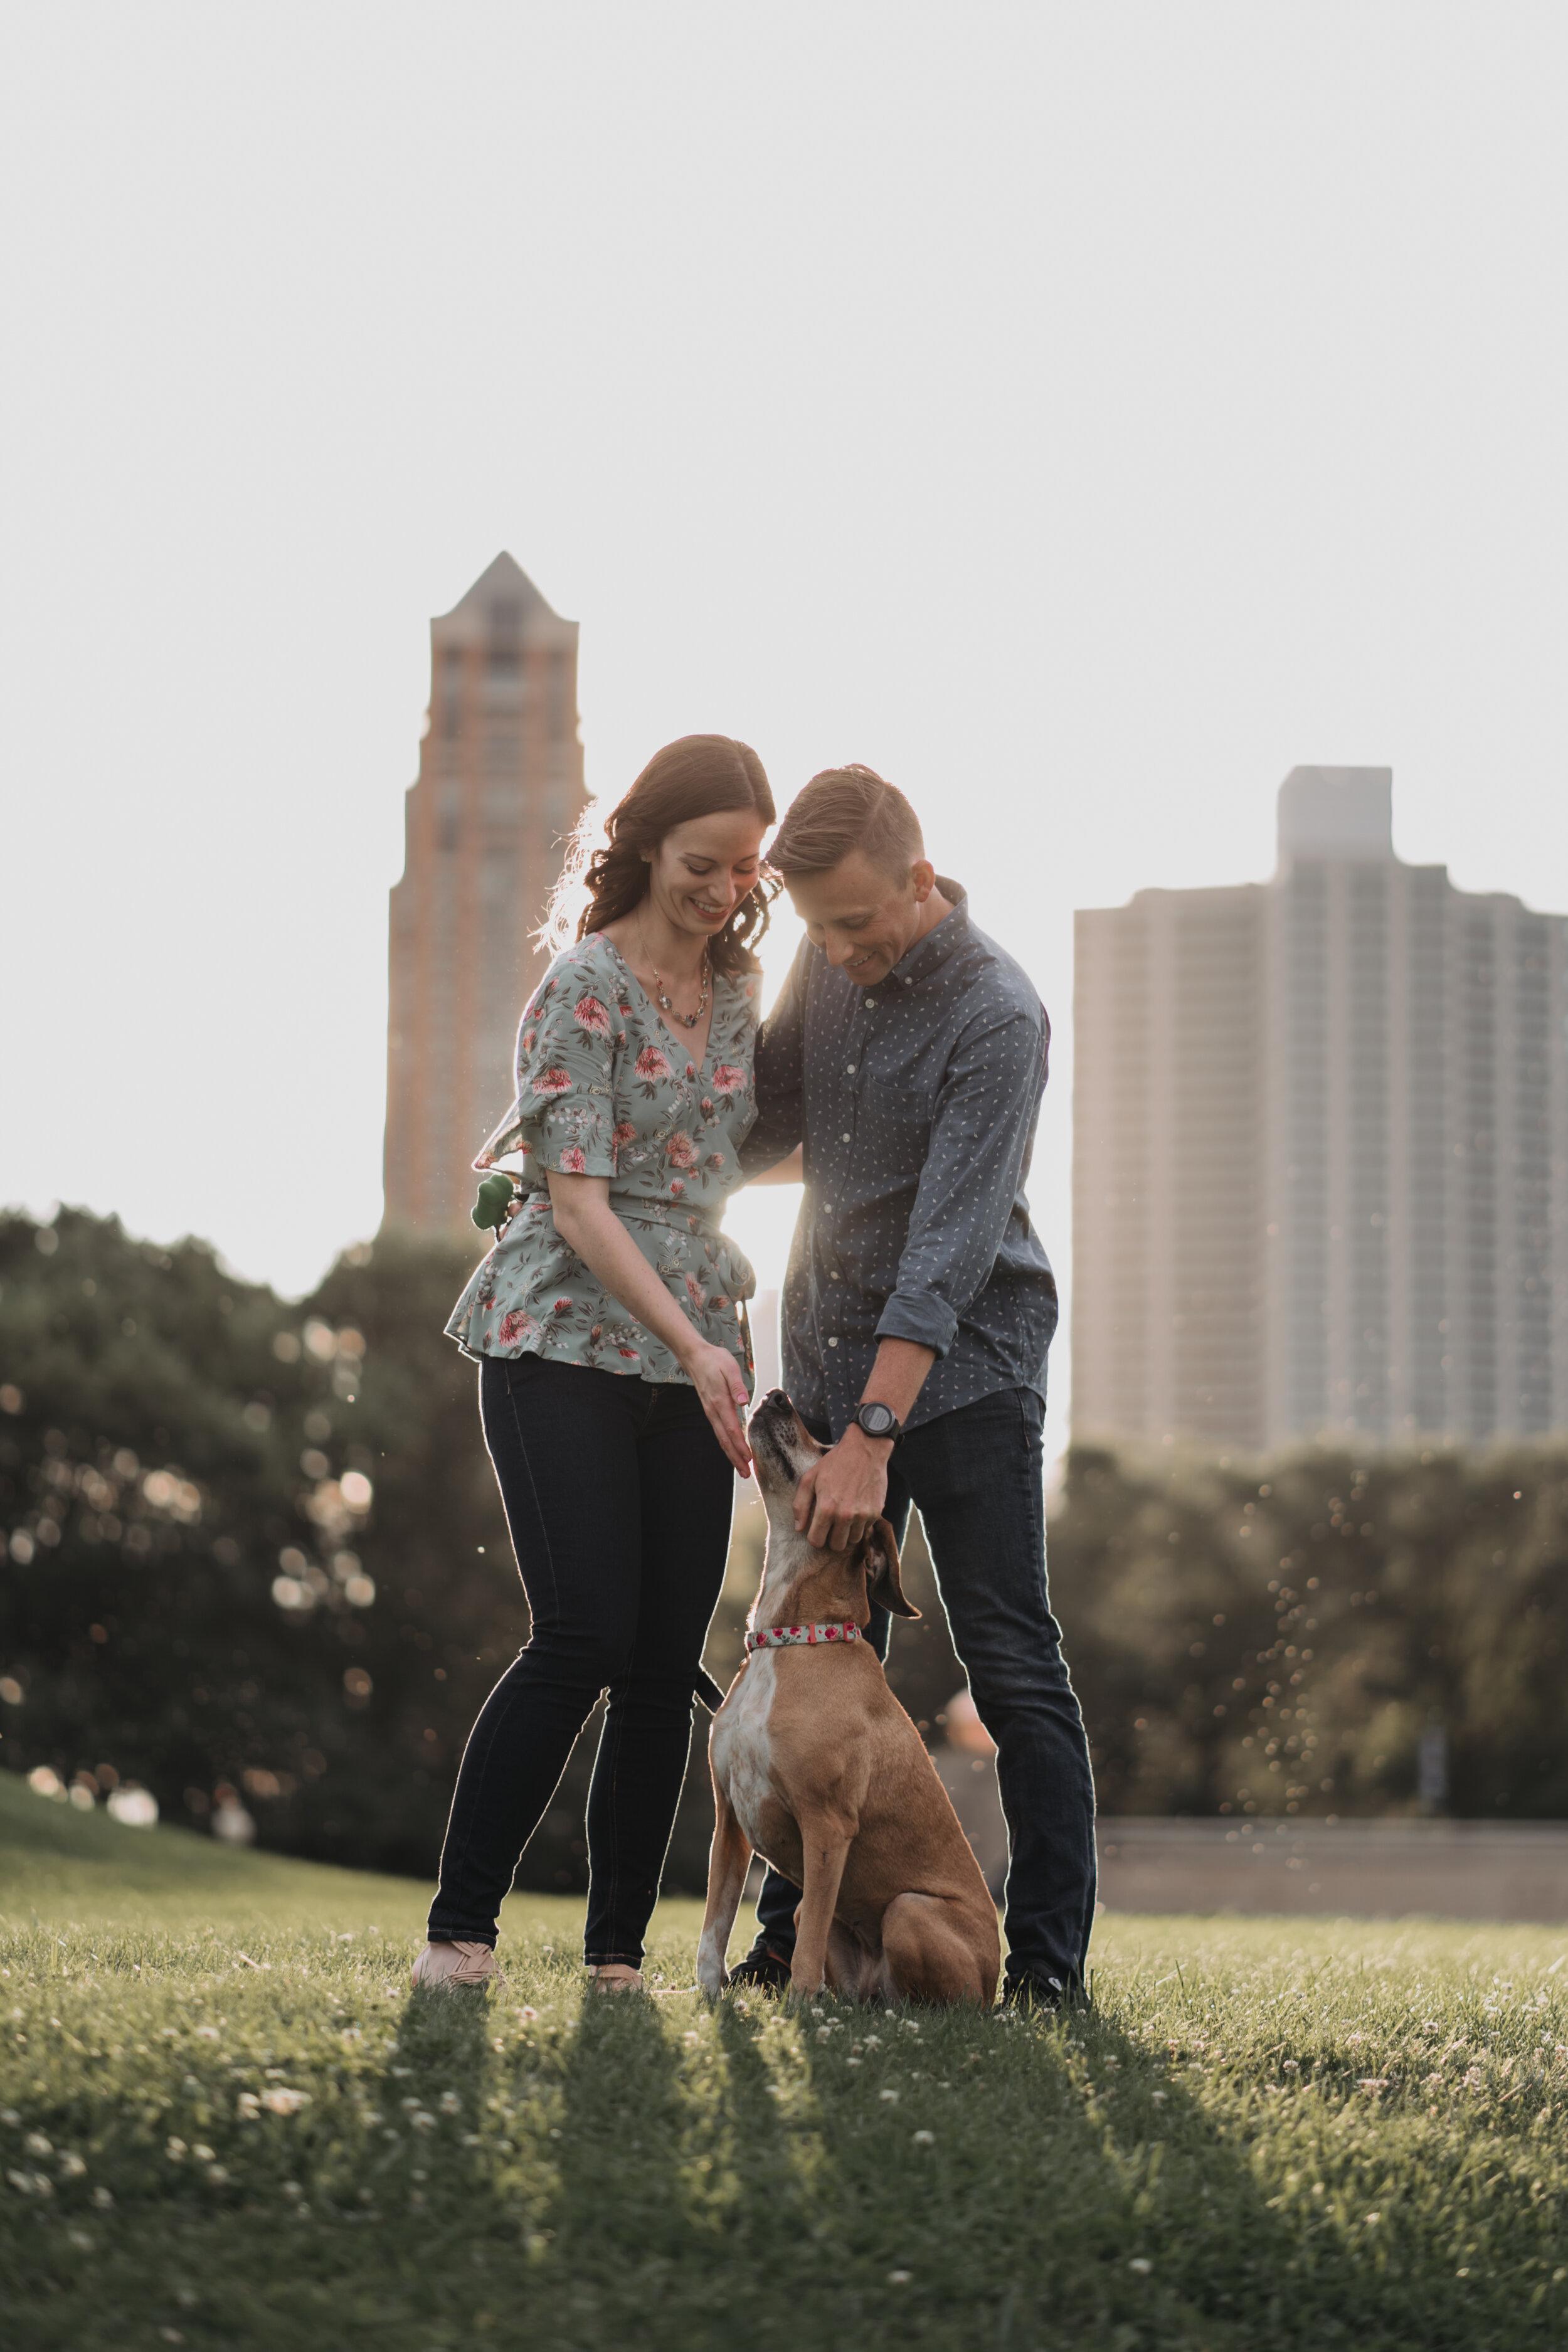 Erin & Jeff Engagement Photos - Datflipmel Photo & Films-00108.jpg